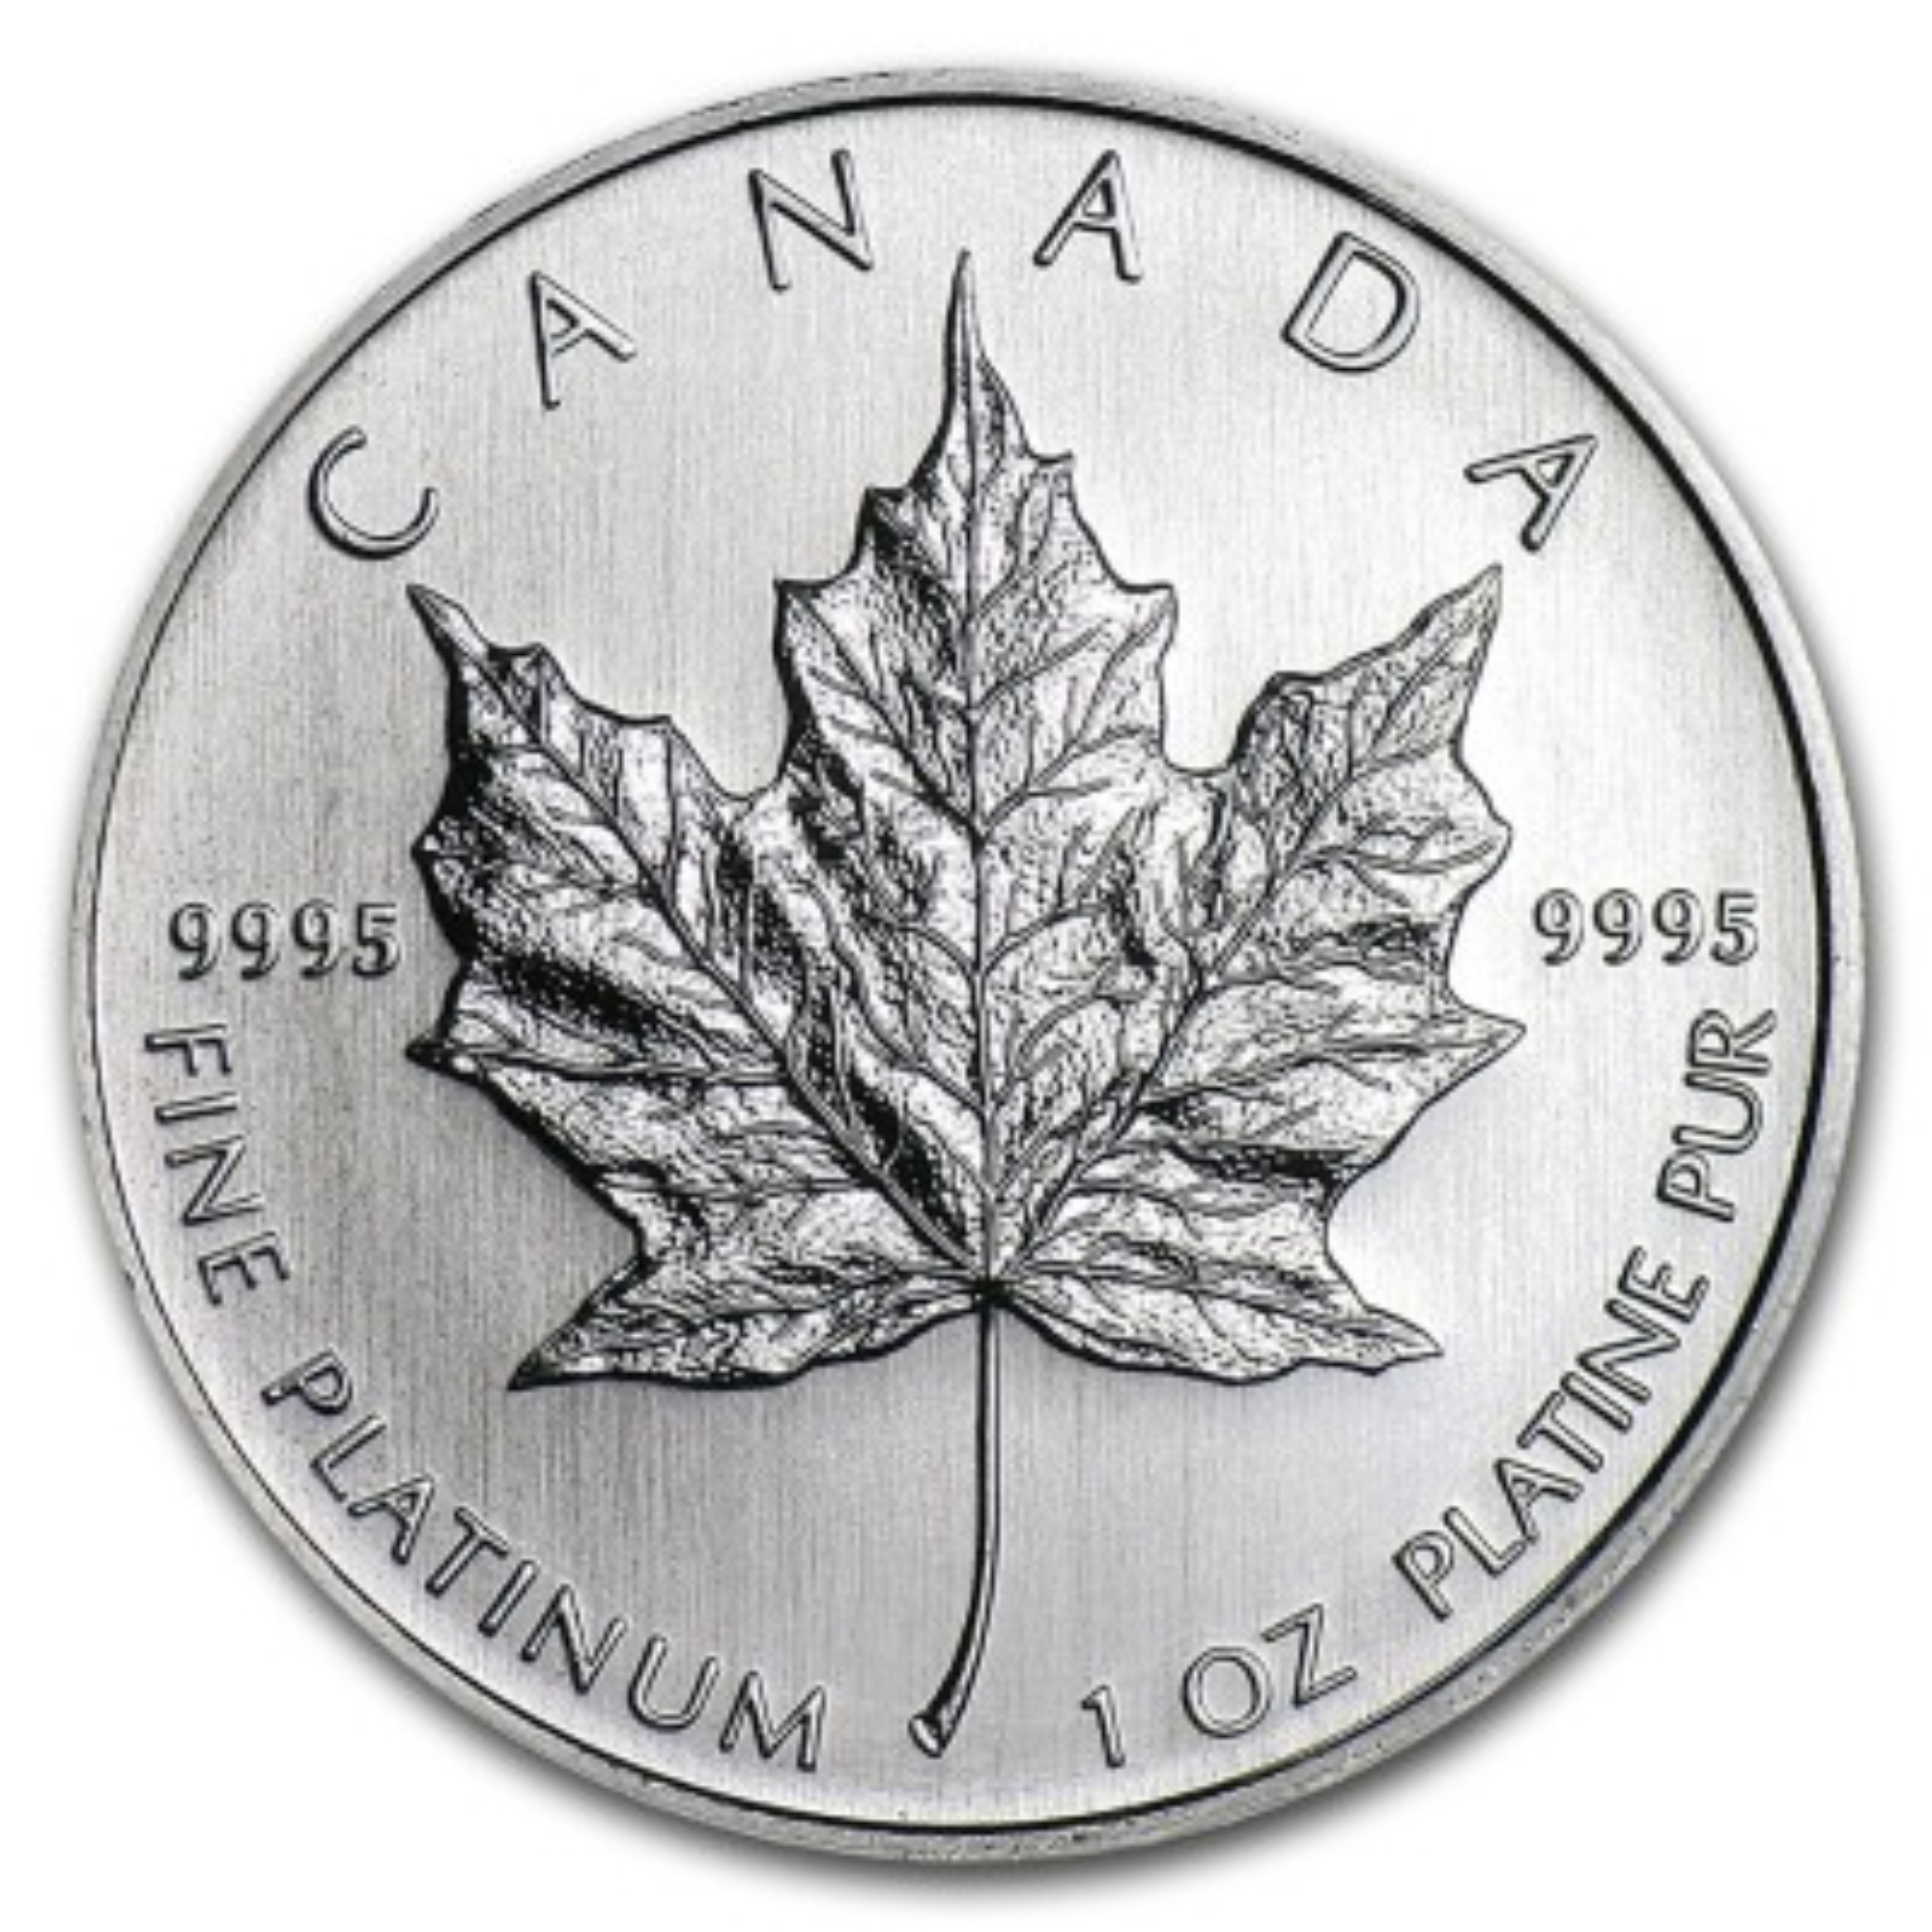 1 Troy ounce platinum Maple Leaf